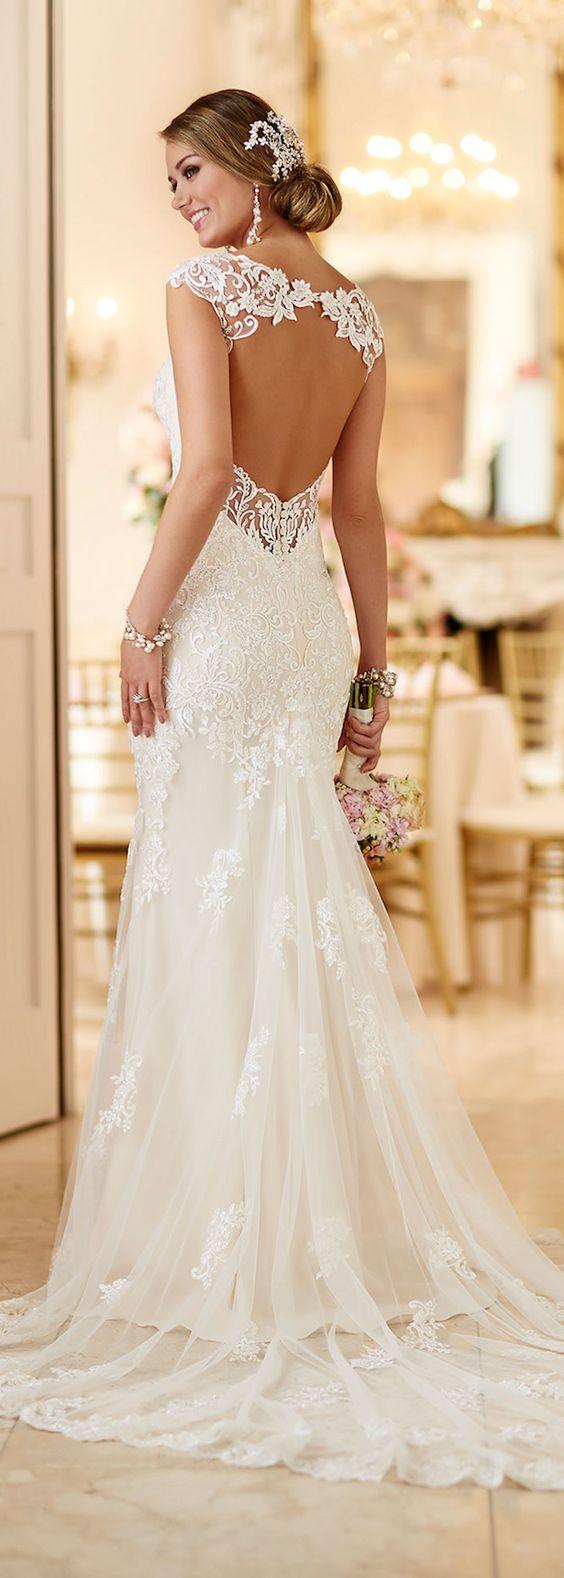 Best wedding dresses for under 1000  Gorgeous backless floral detail white wedding dress  Together